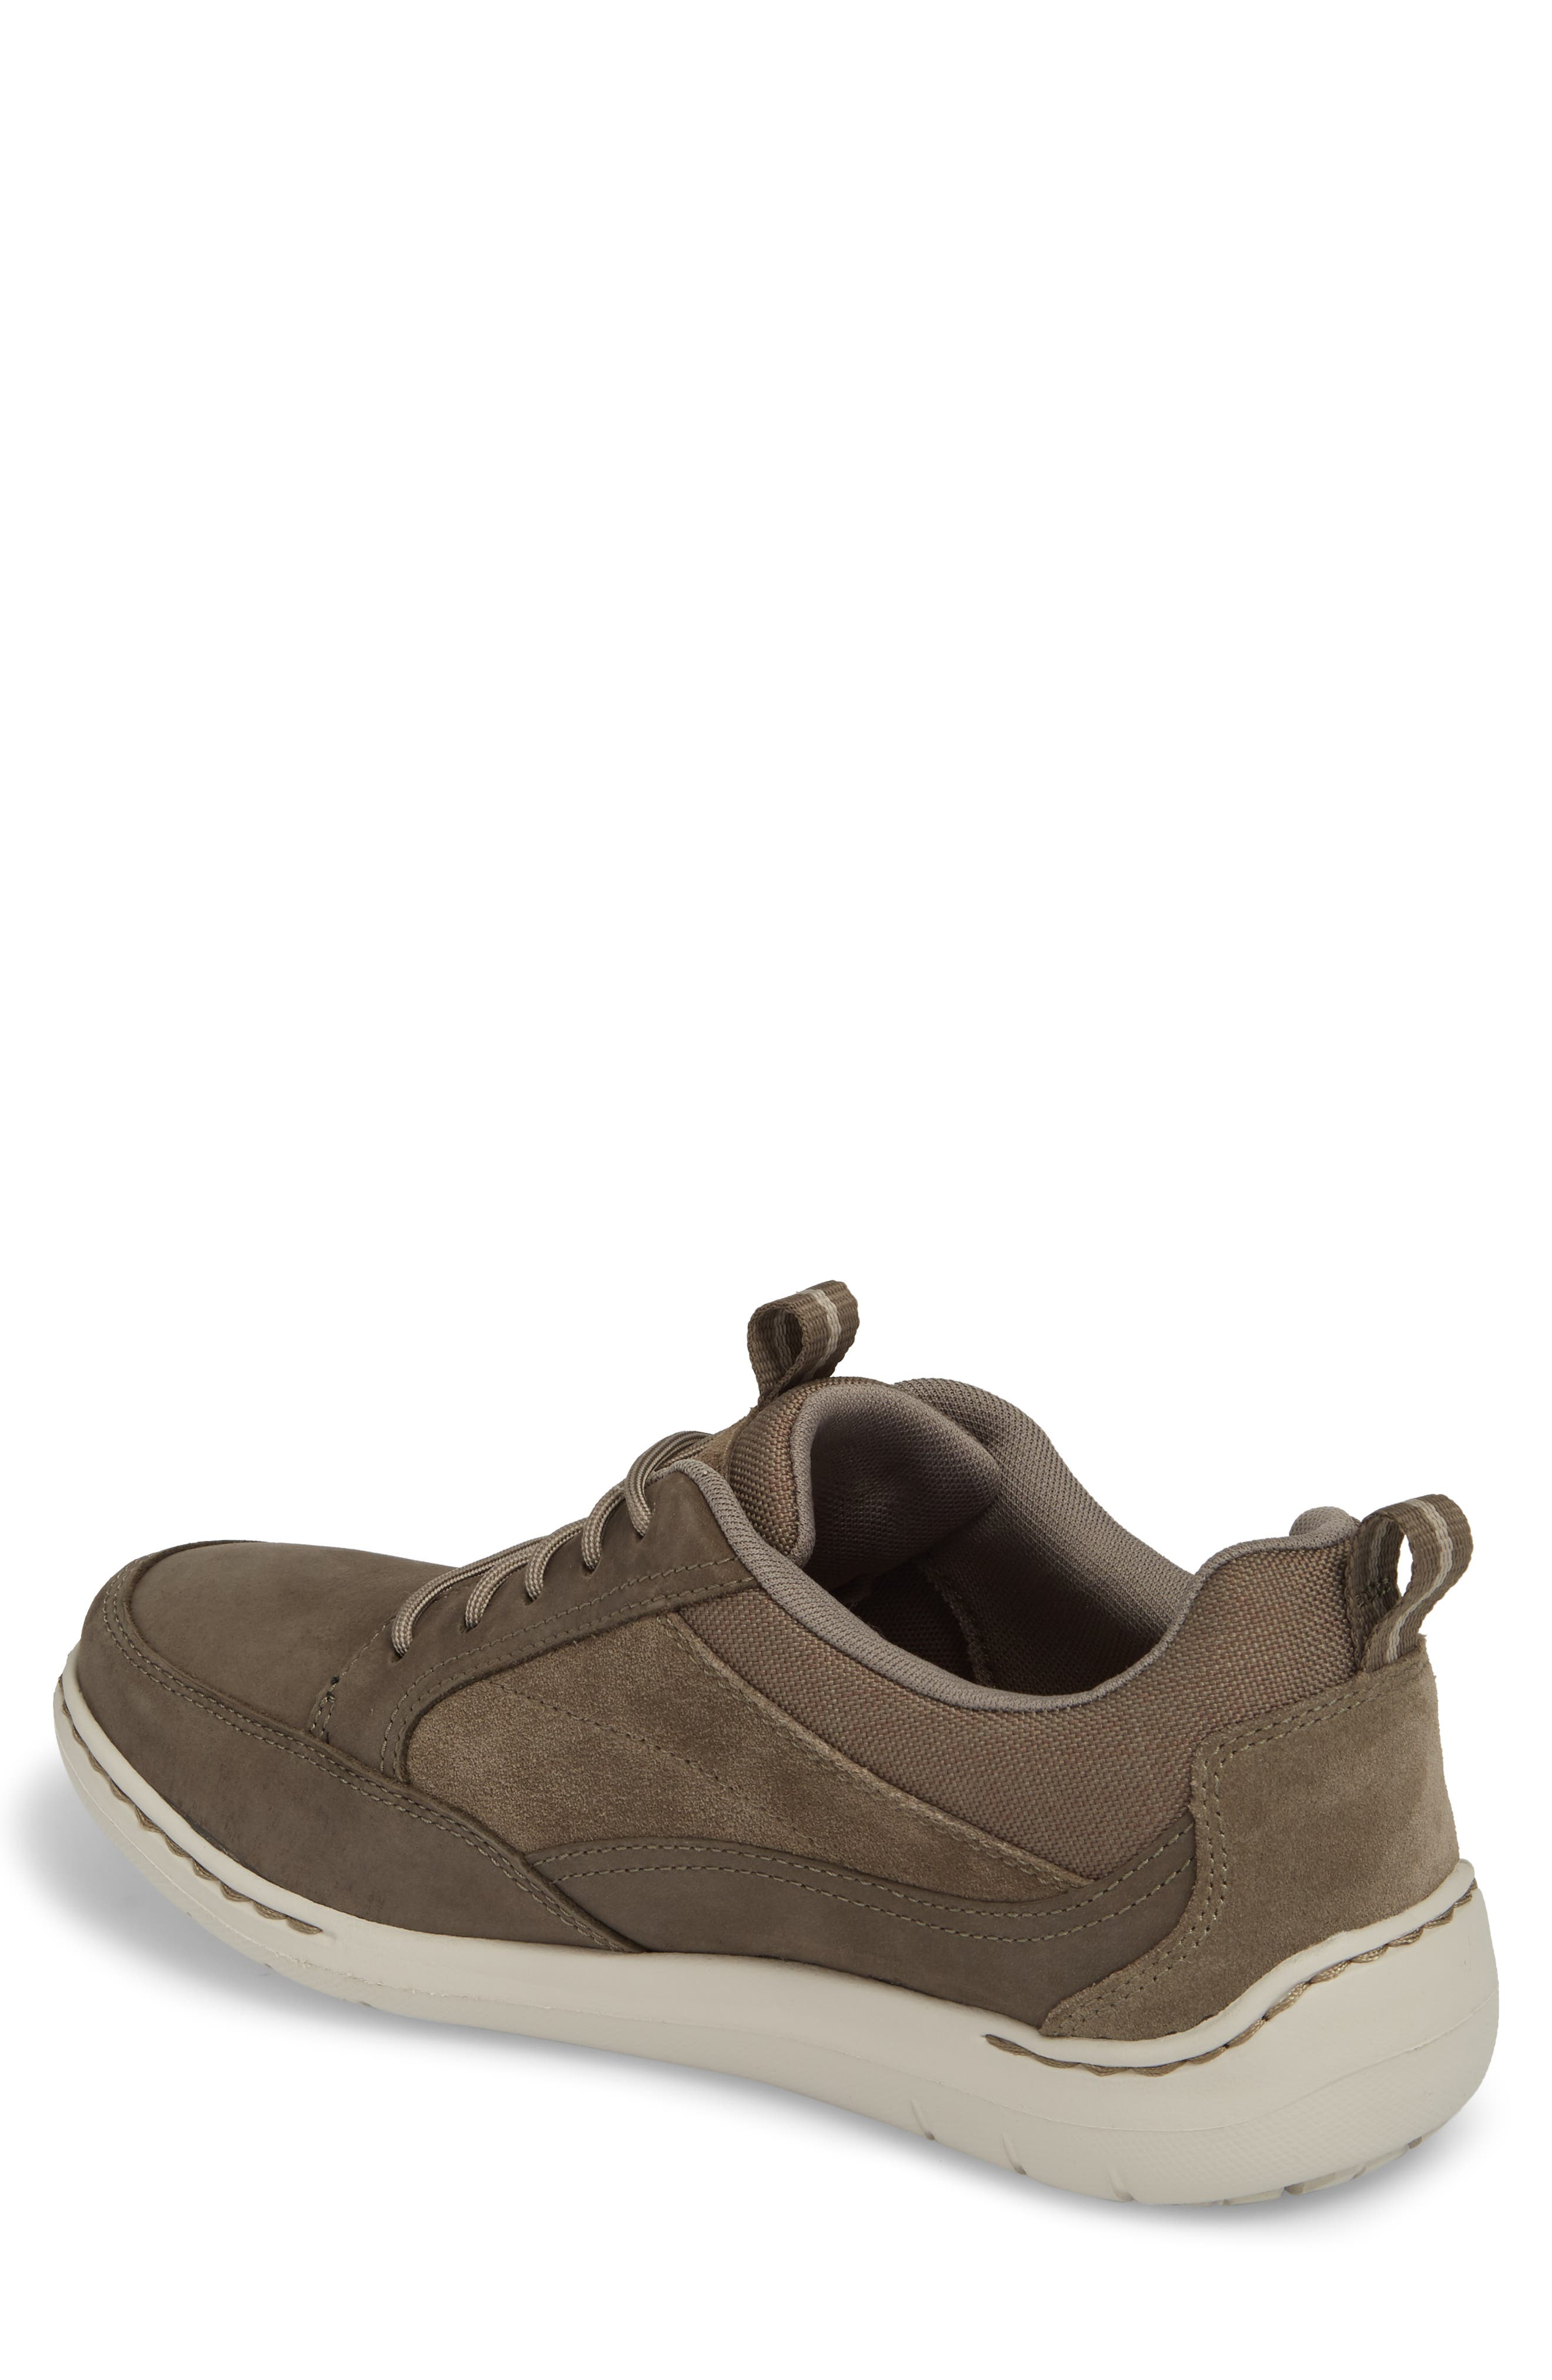 DUNHAM, D Fit Smart Sneaker, Alternate thumbnail 2, color, BROWN